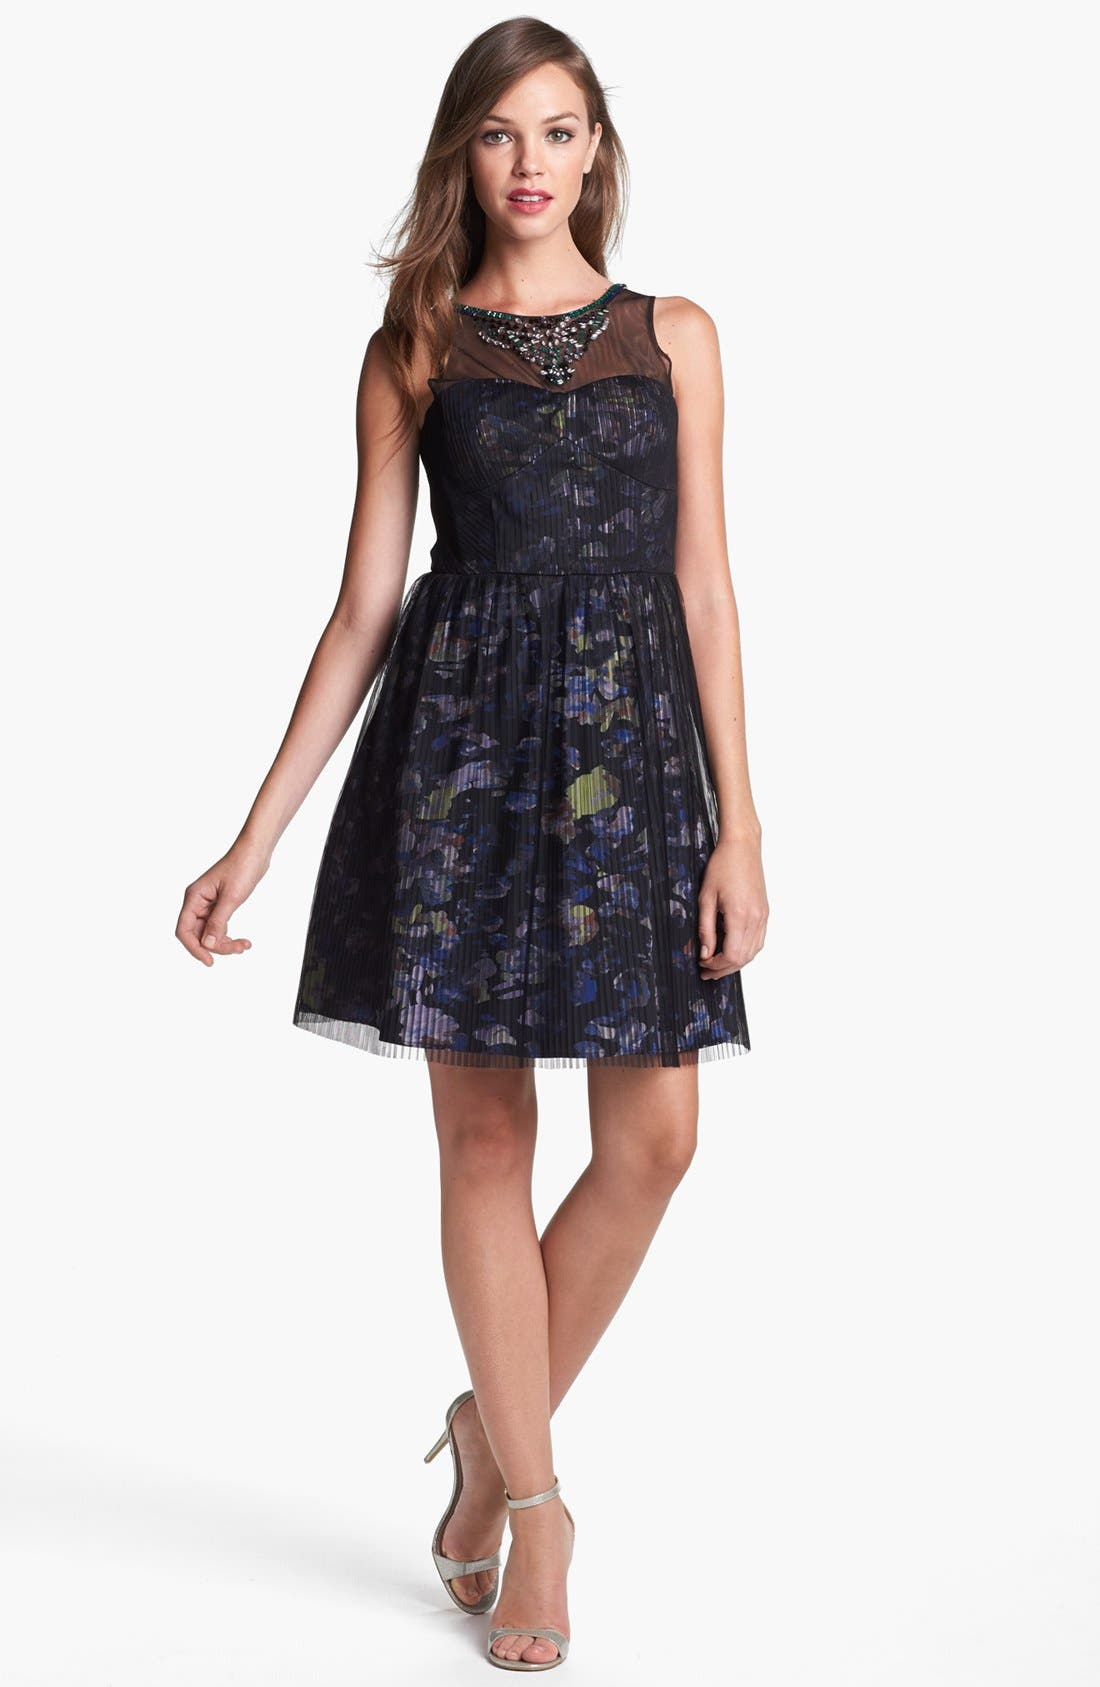 Alternate Image 1 Selected - BCBGMAXAZRIA 'Illusion' Dress